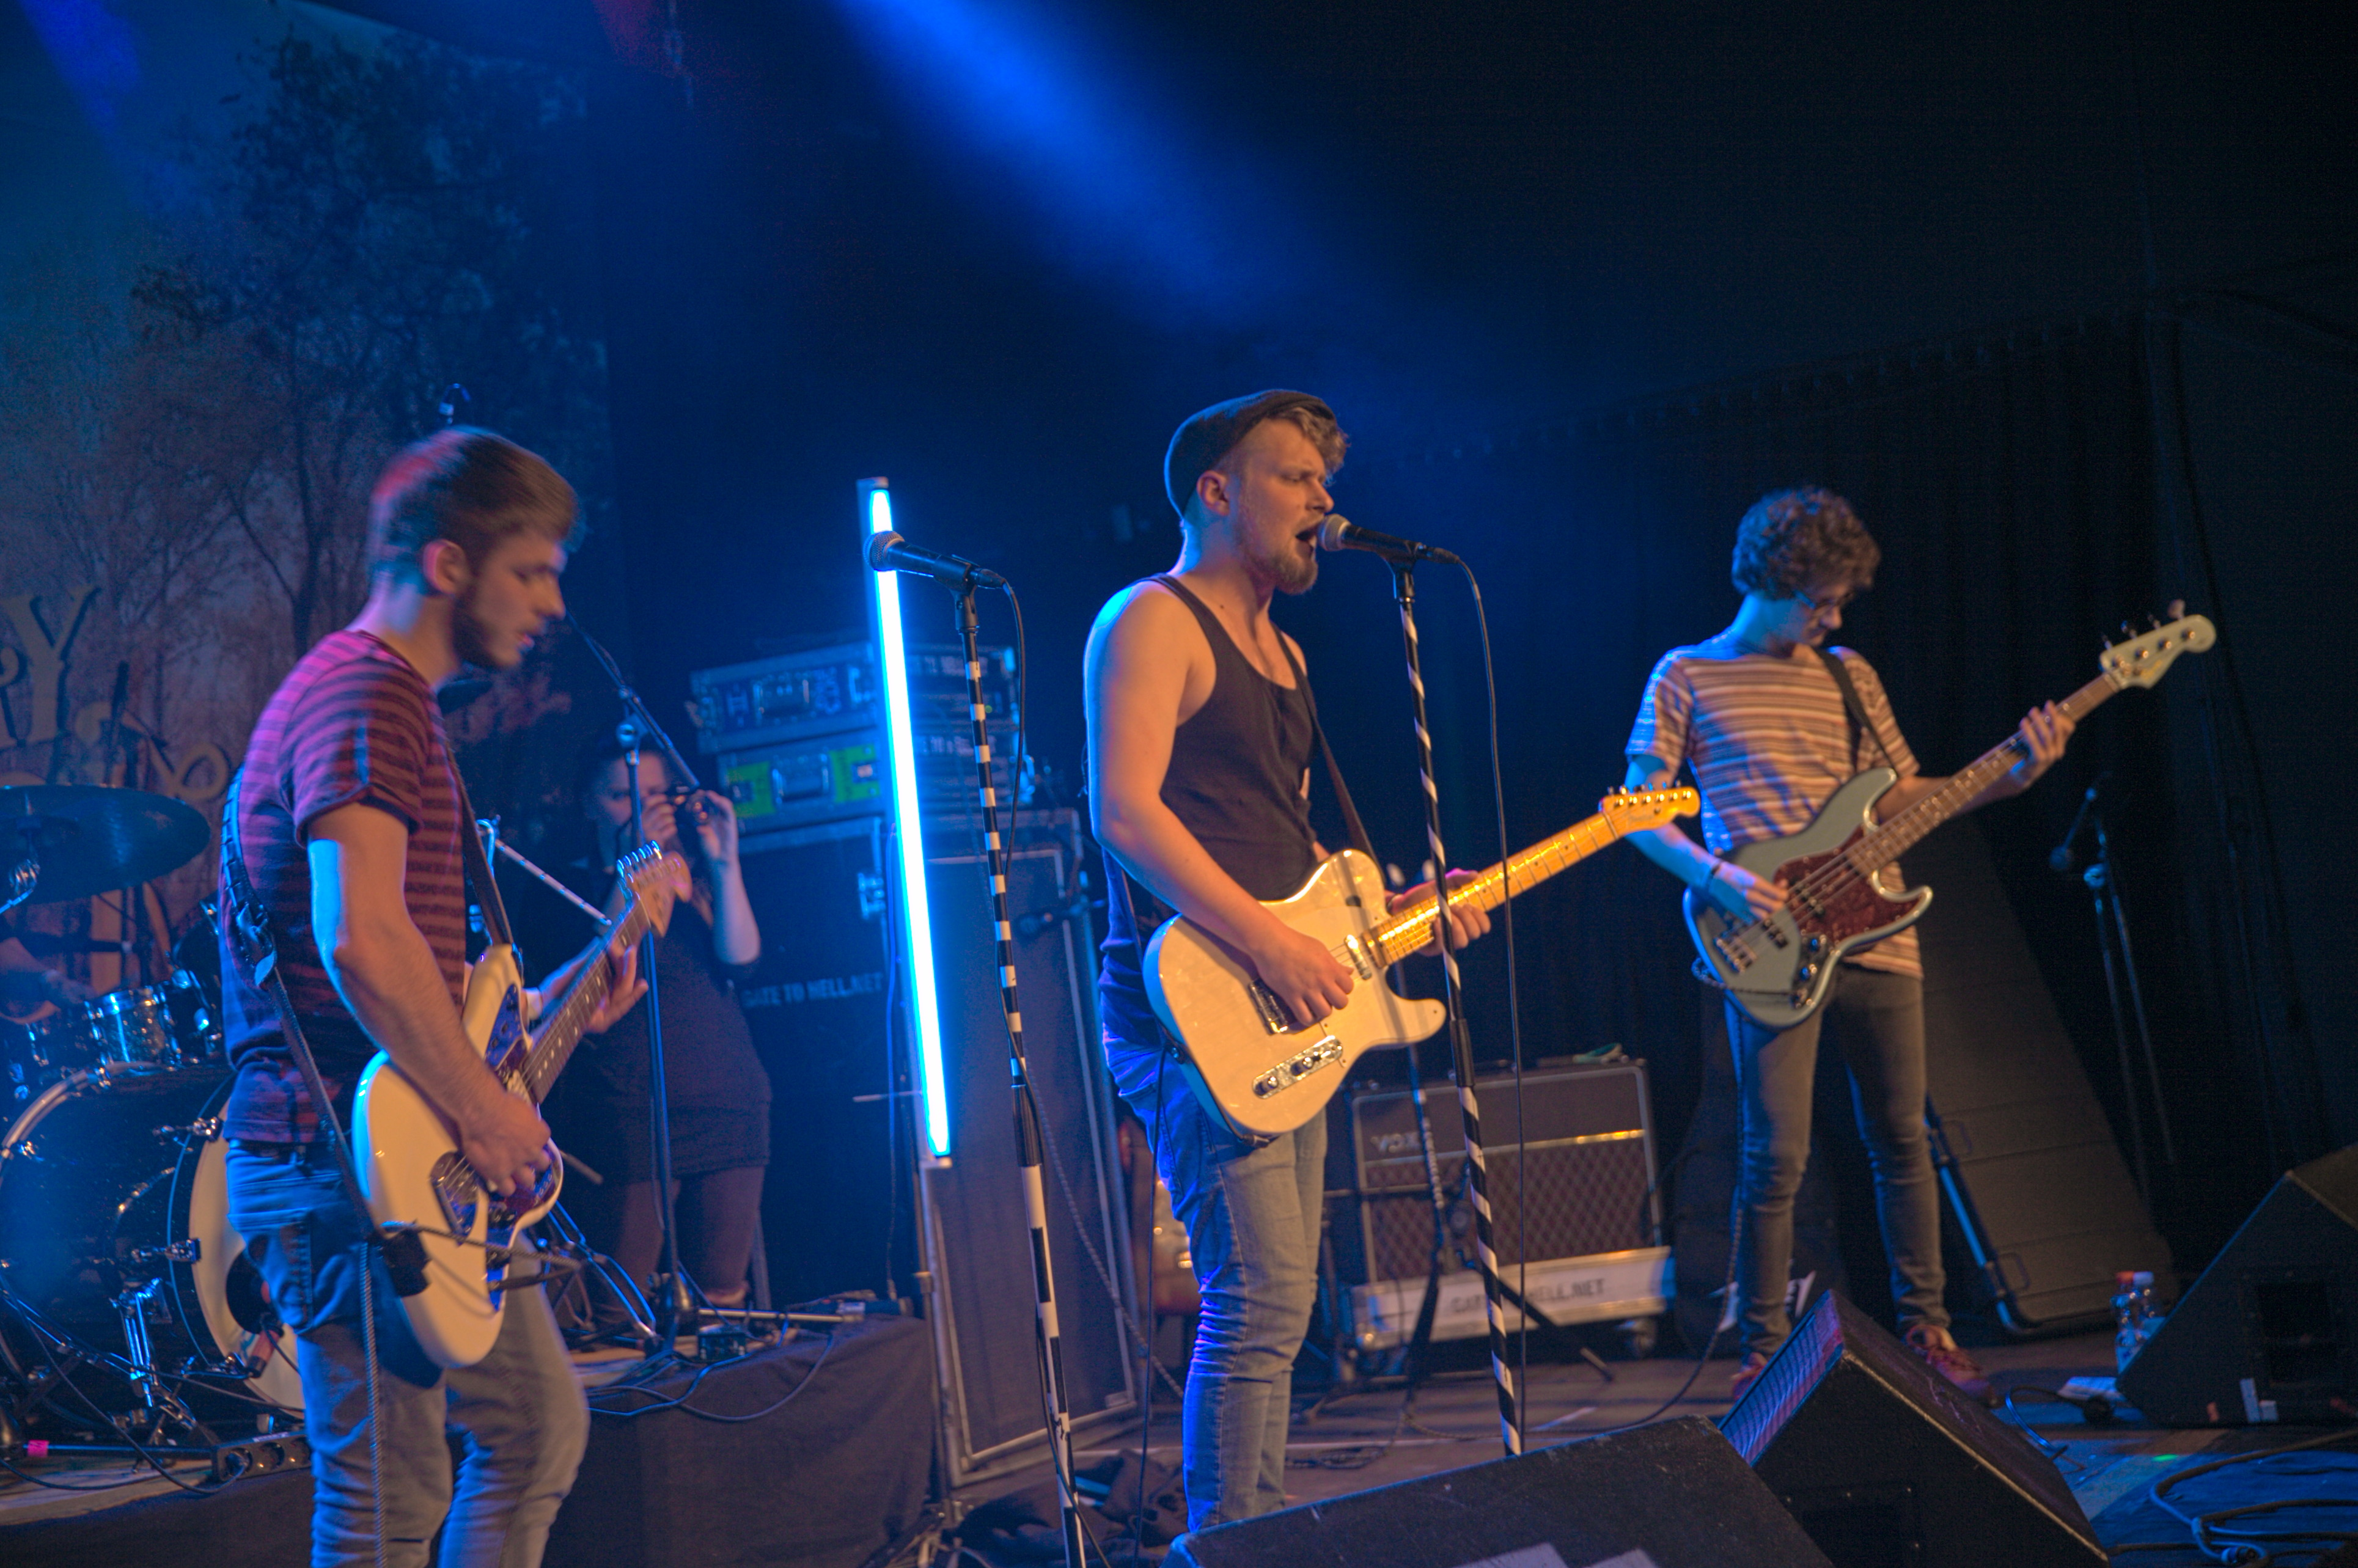 Drens auf dem Way Back When Festival, 2015